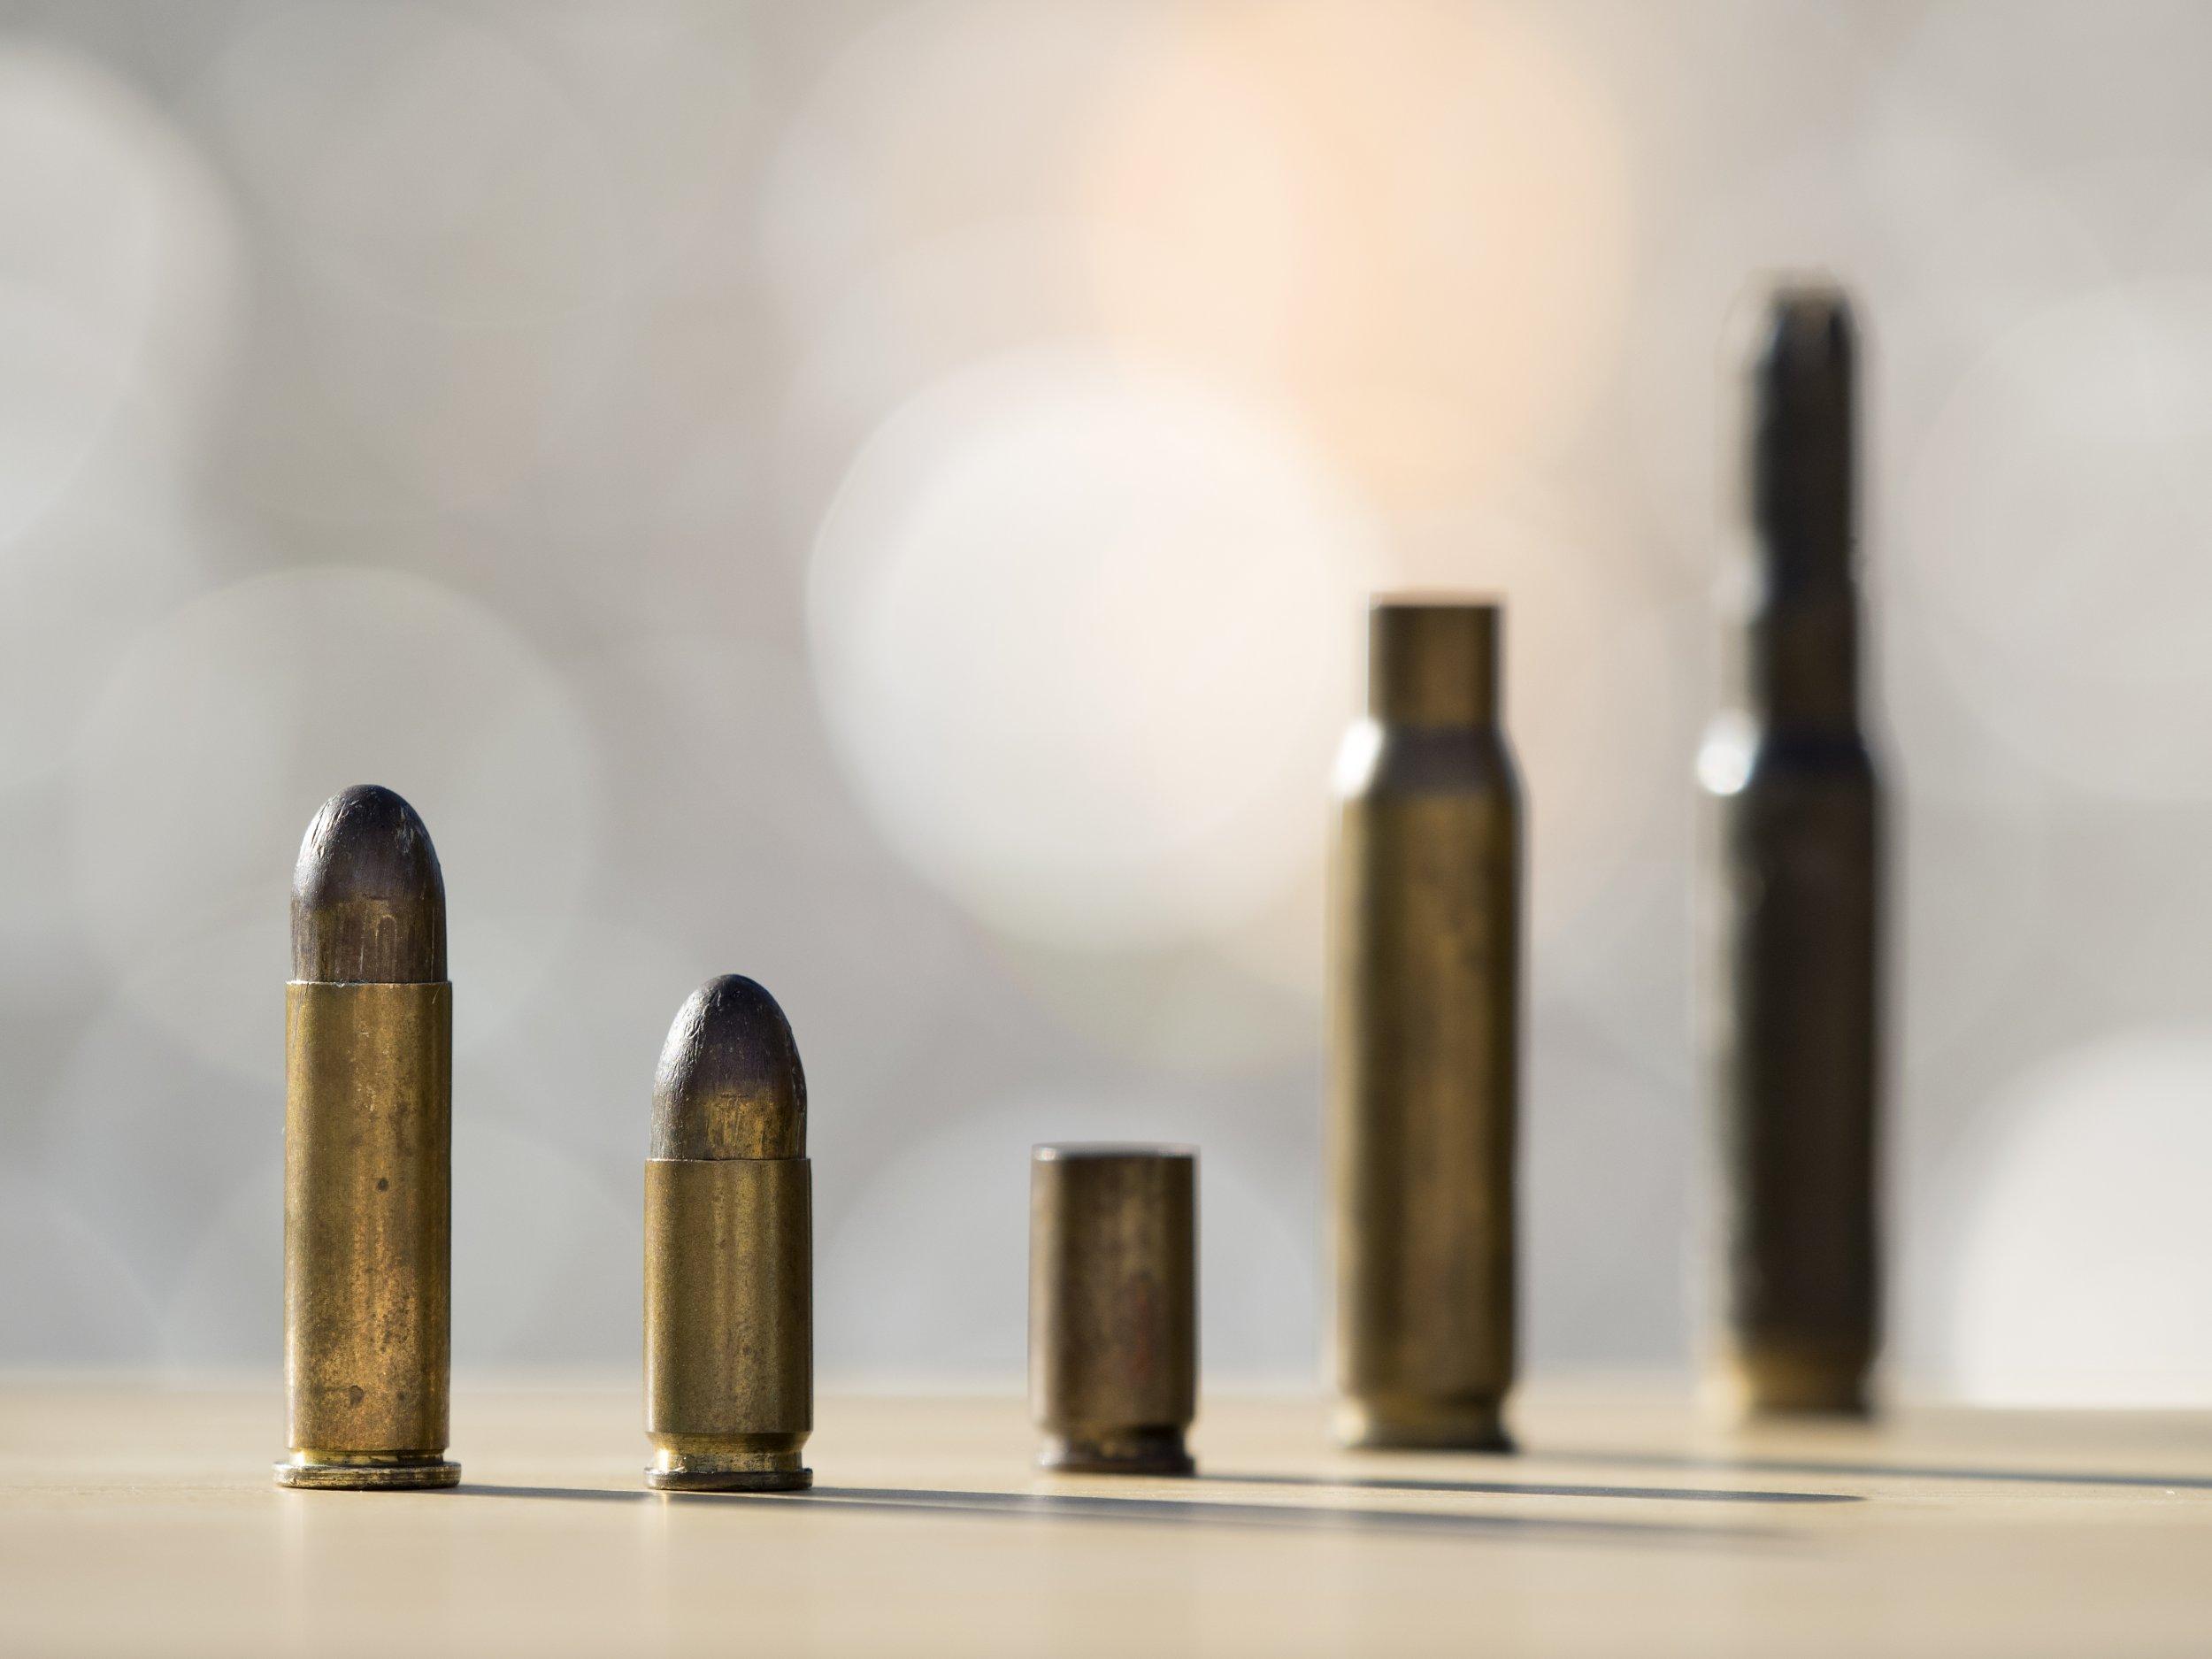 Guns in America: The Debate Over Lead-Based Bullets